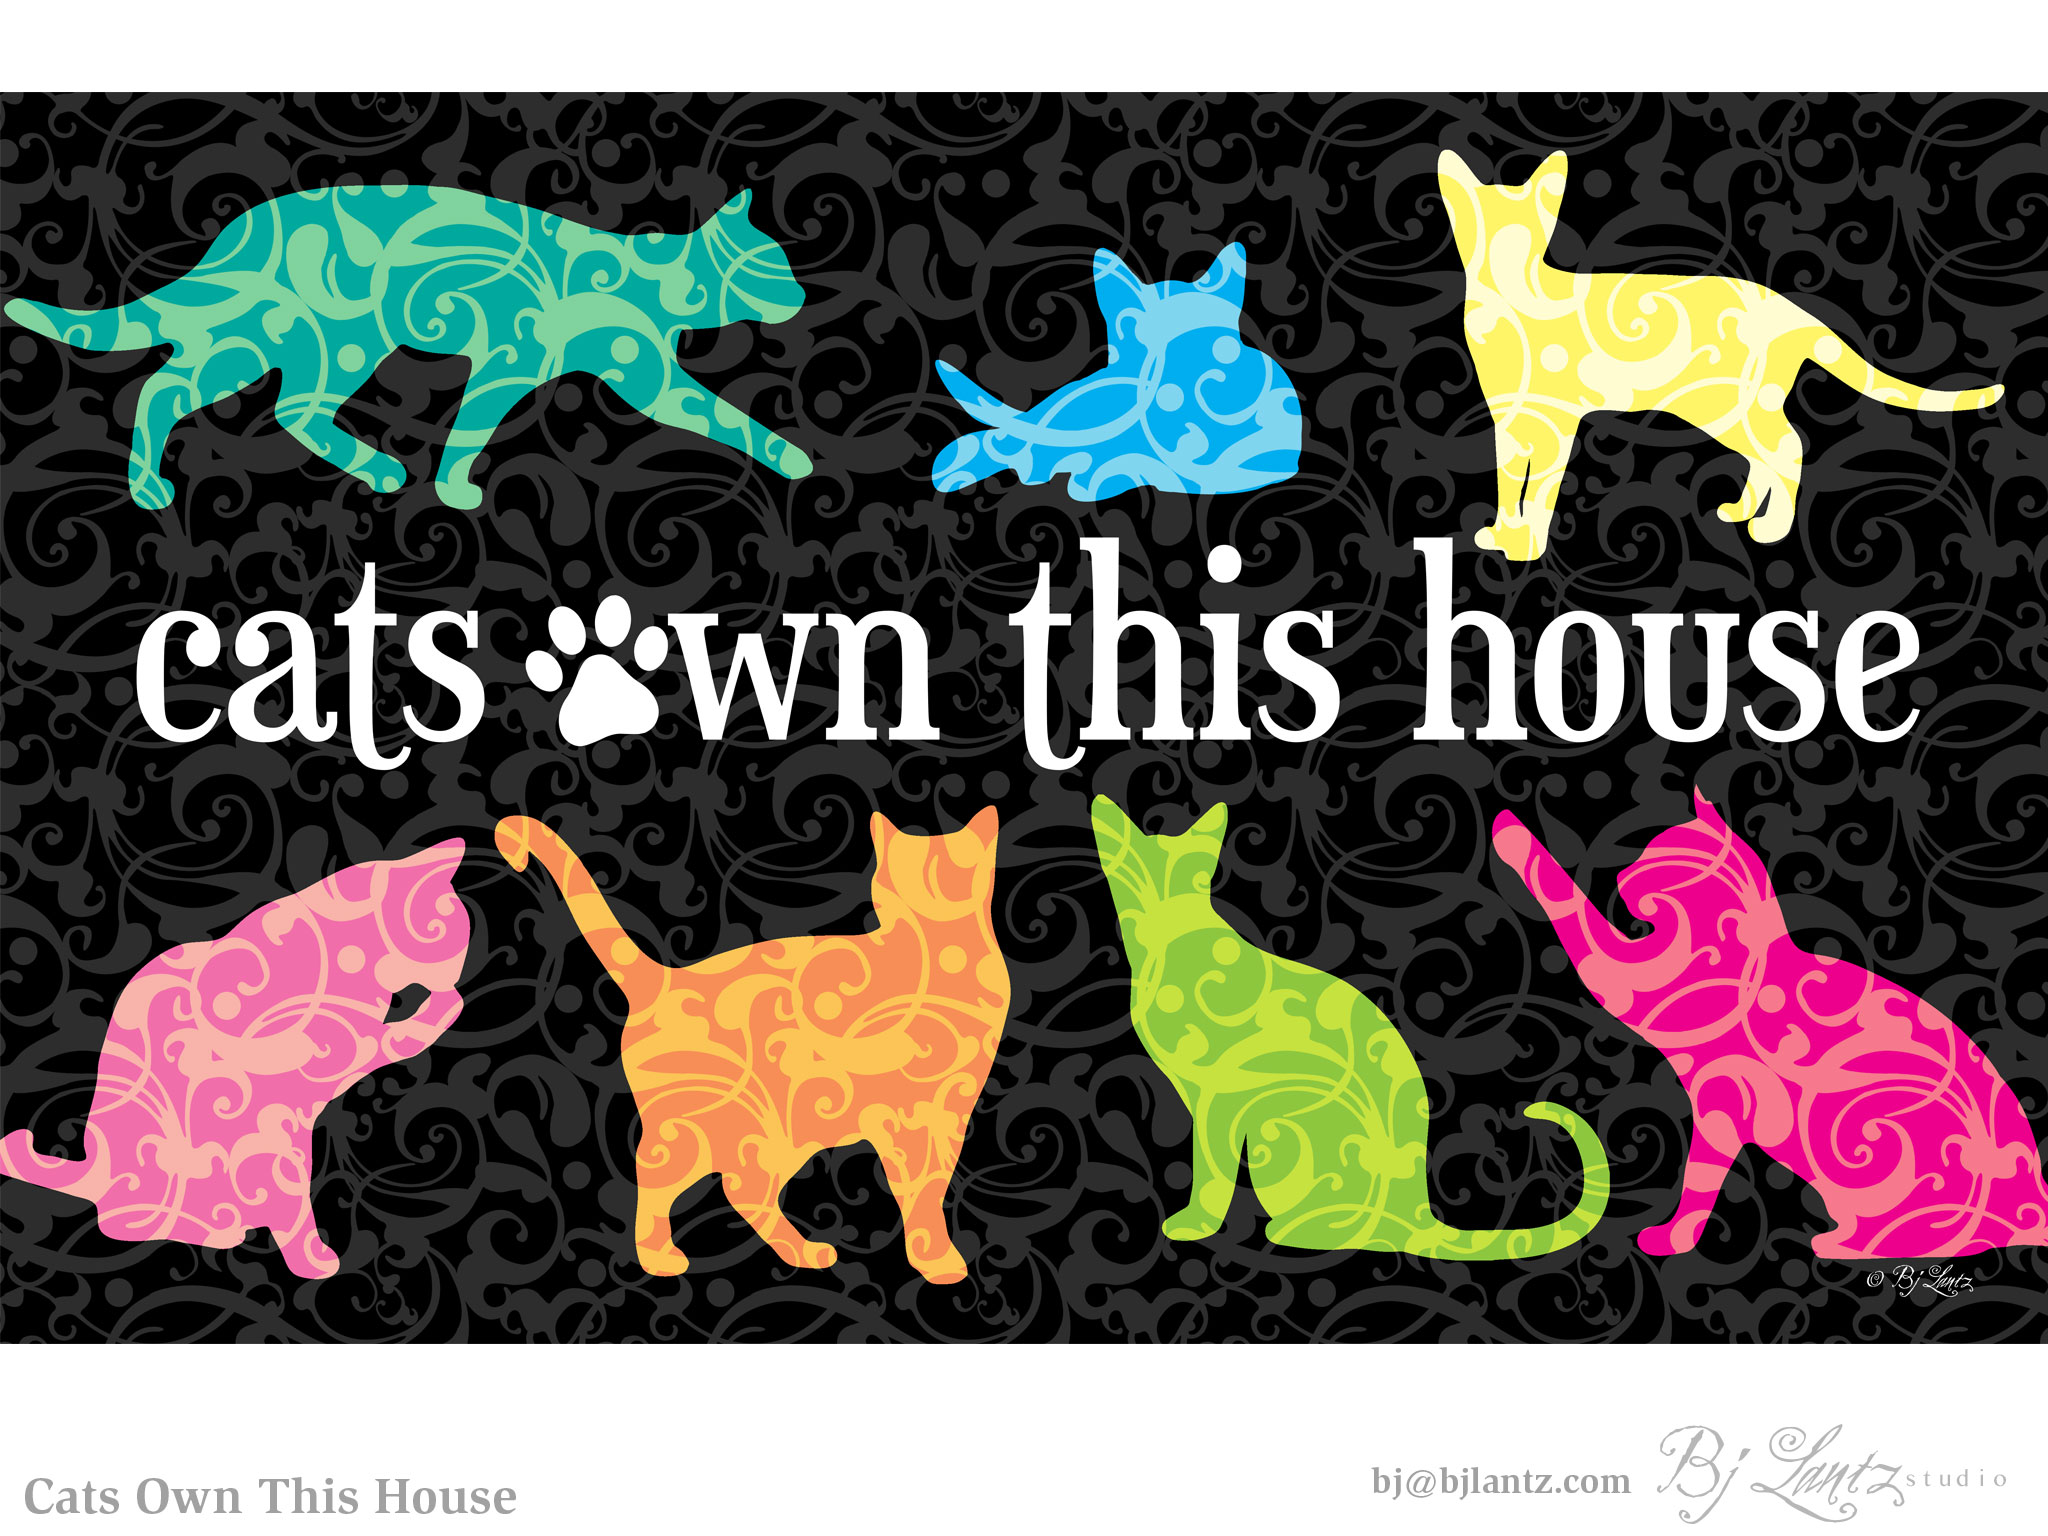 CatsOwnThisHouse_BJLantz_2.jpg